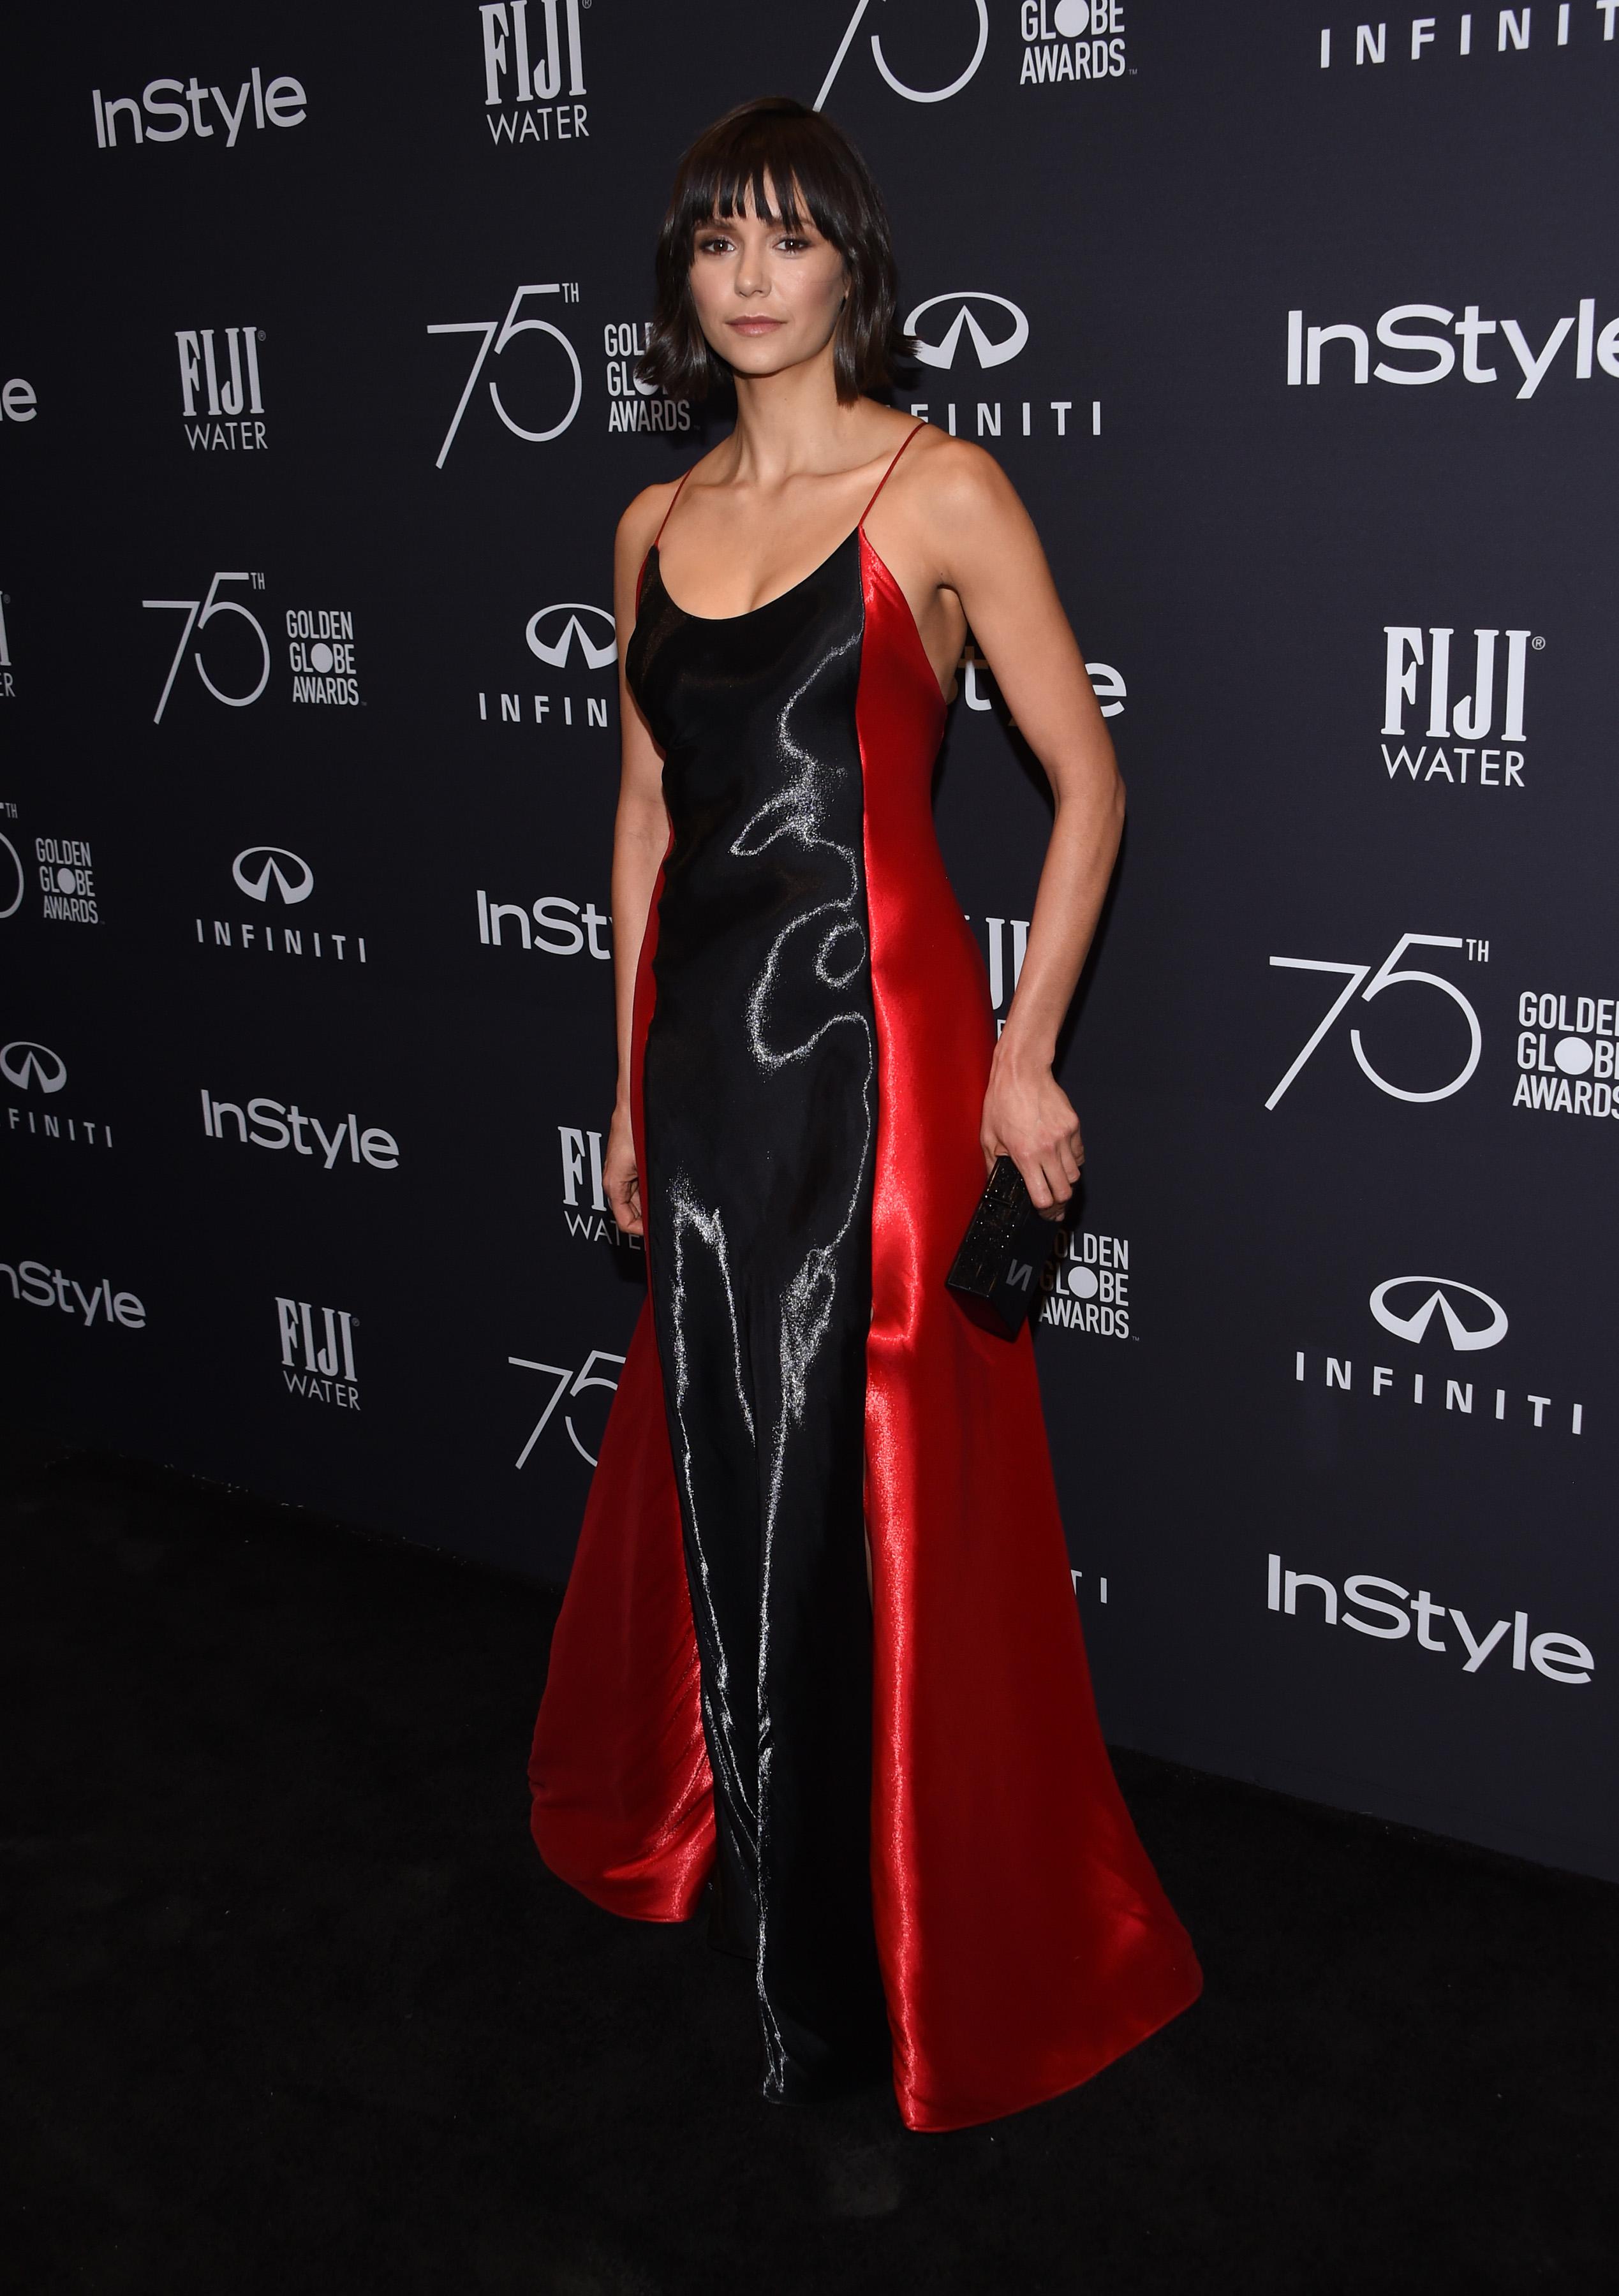 Nina Dobrev 75th Golden Globe Awards Anniversary 1